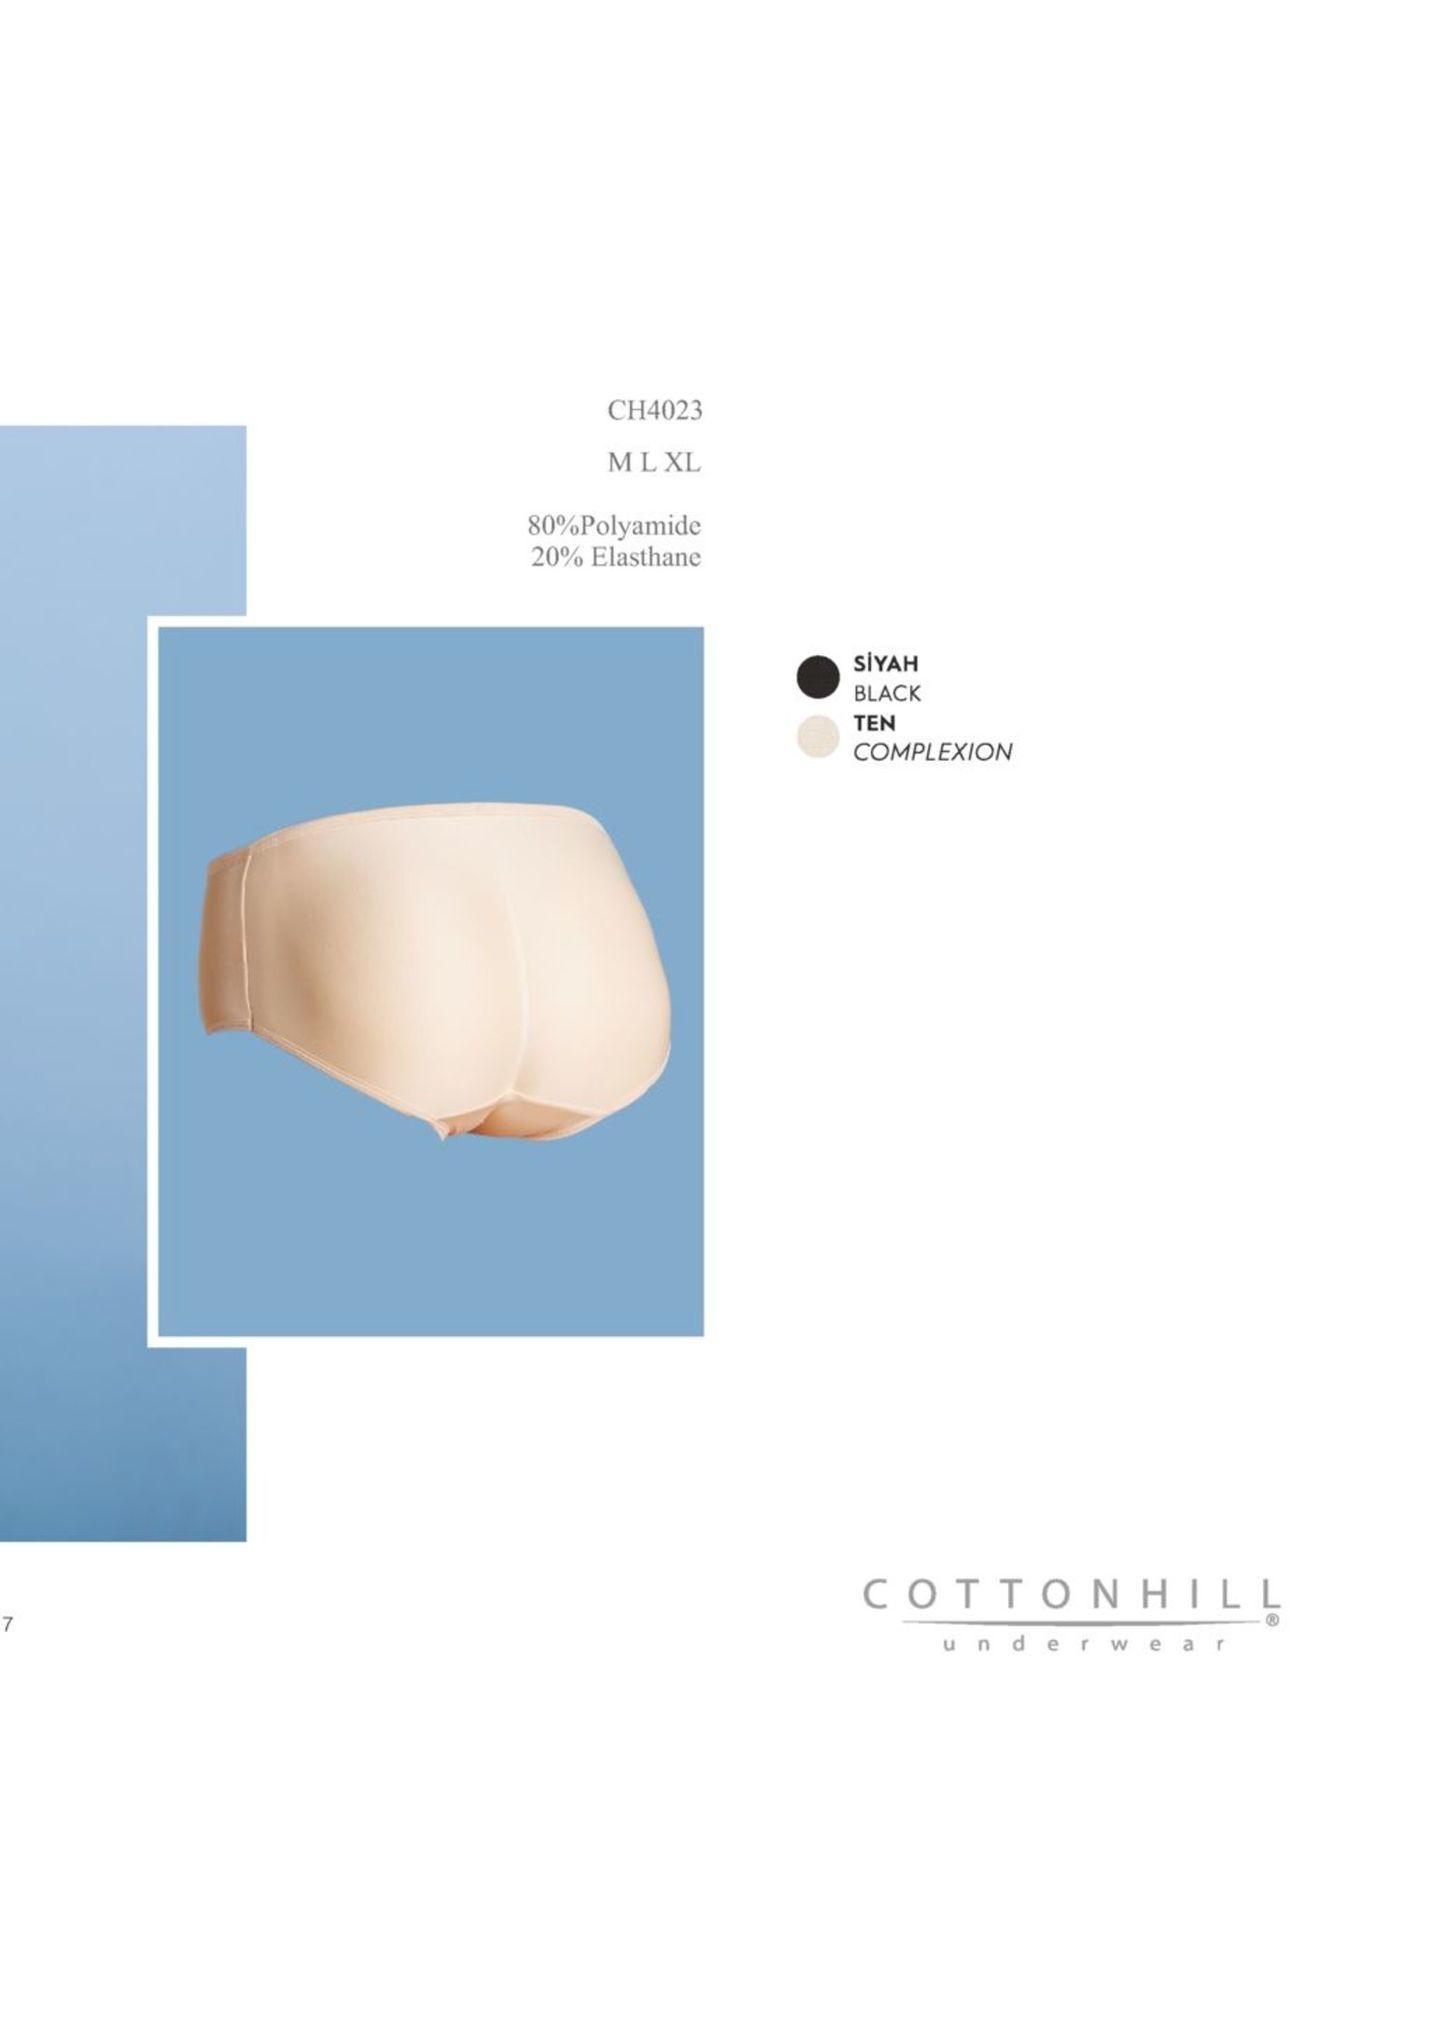 ch4023 mlxl 80%polyamide 20% elasthane siyah black ten complexion cotton hill underwe a